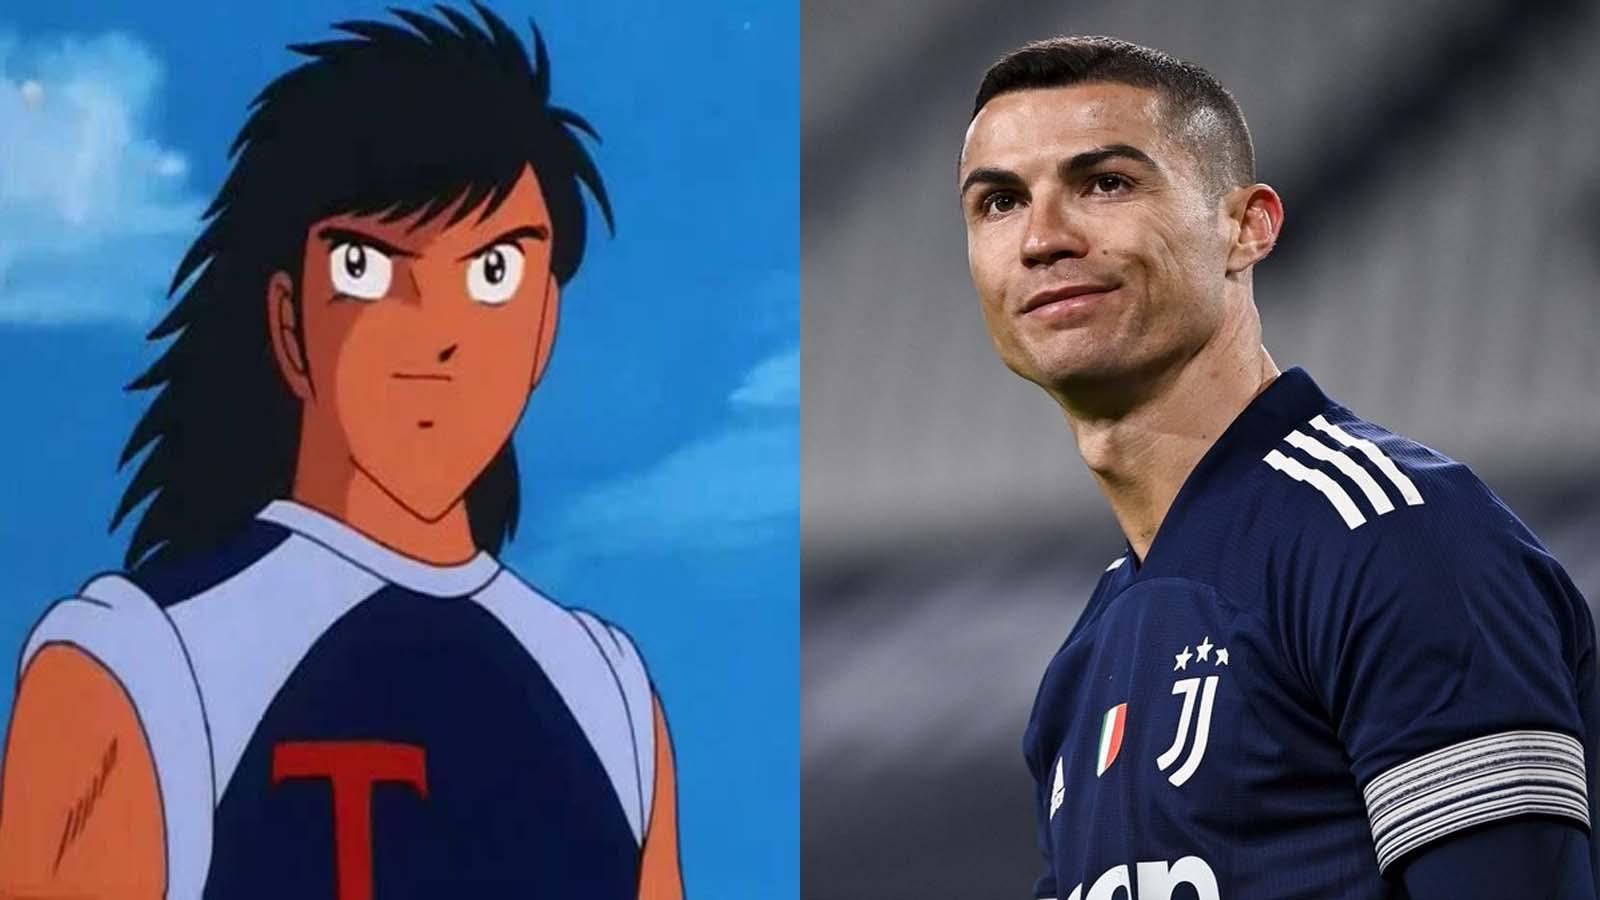 Personajes parecidos a Cristiano Ronaldo - Kojiro Hyuga